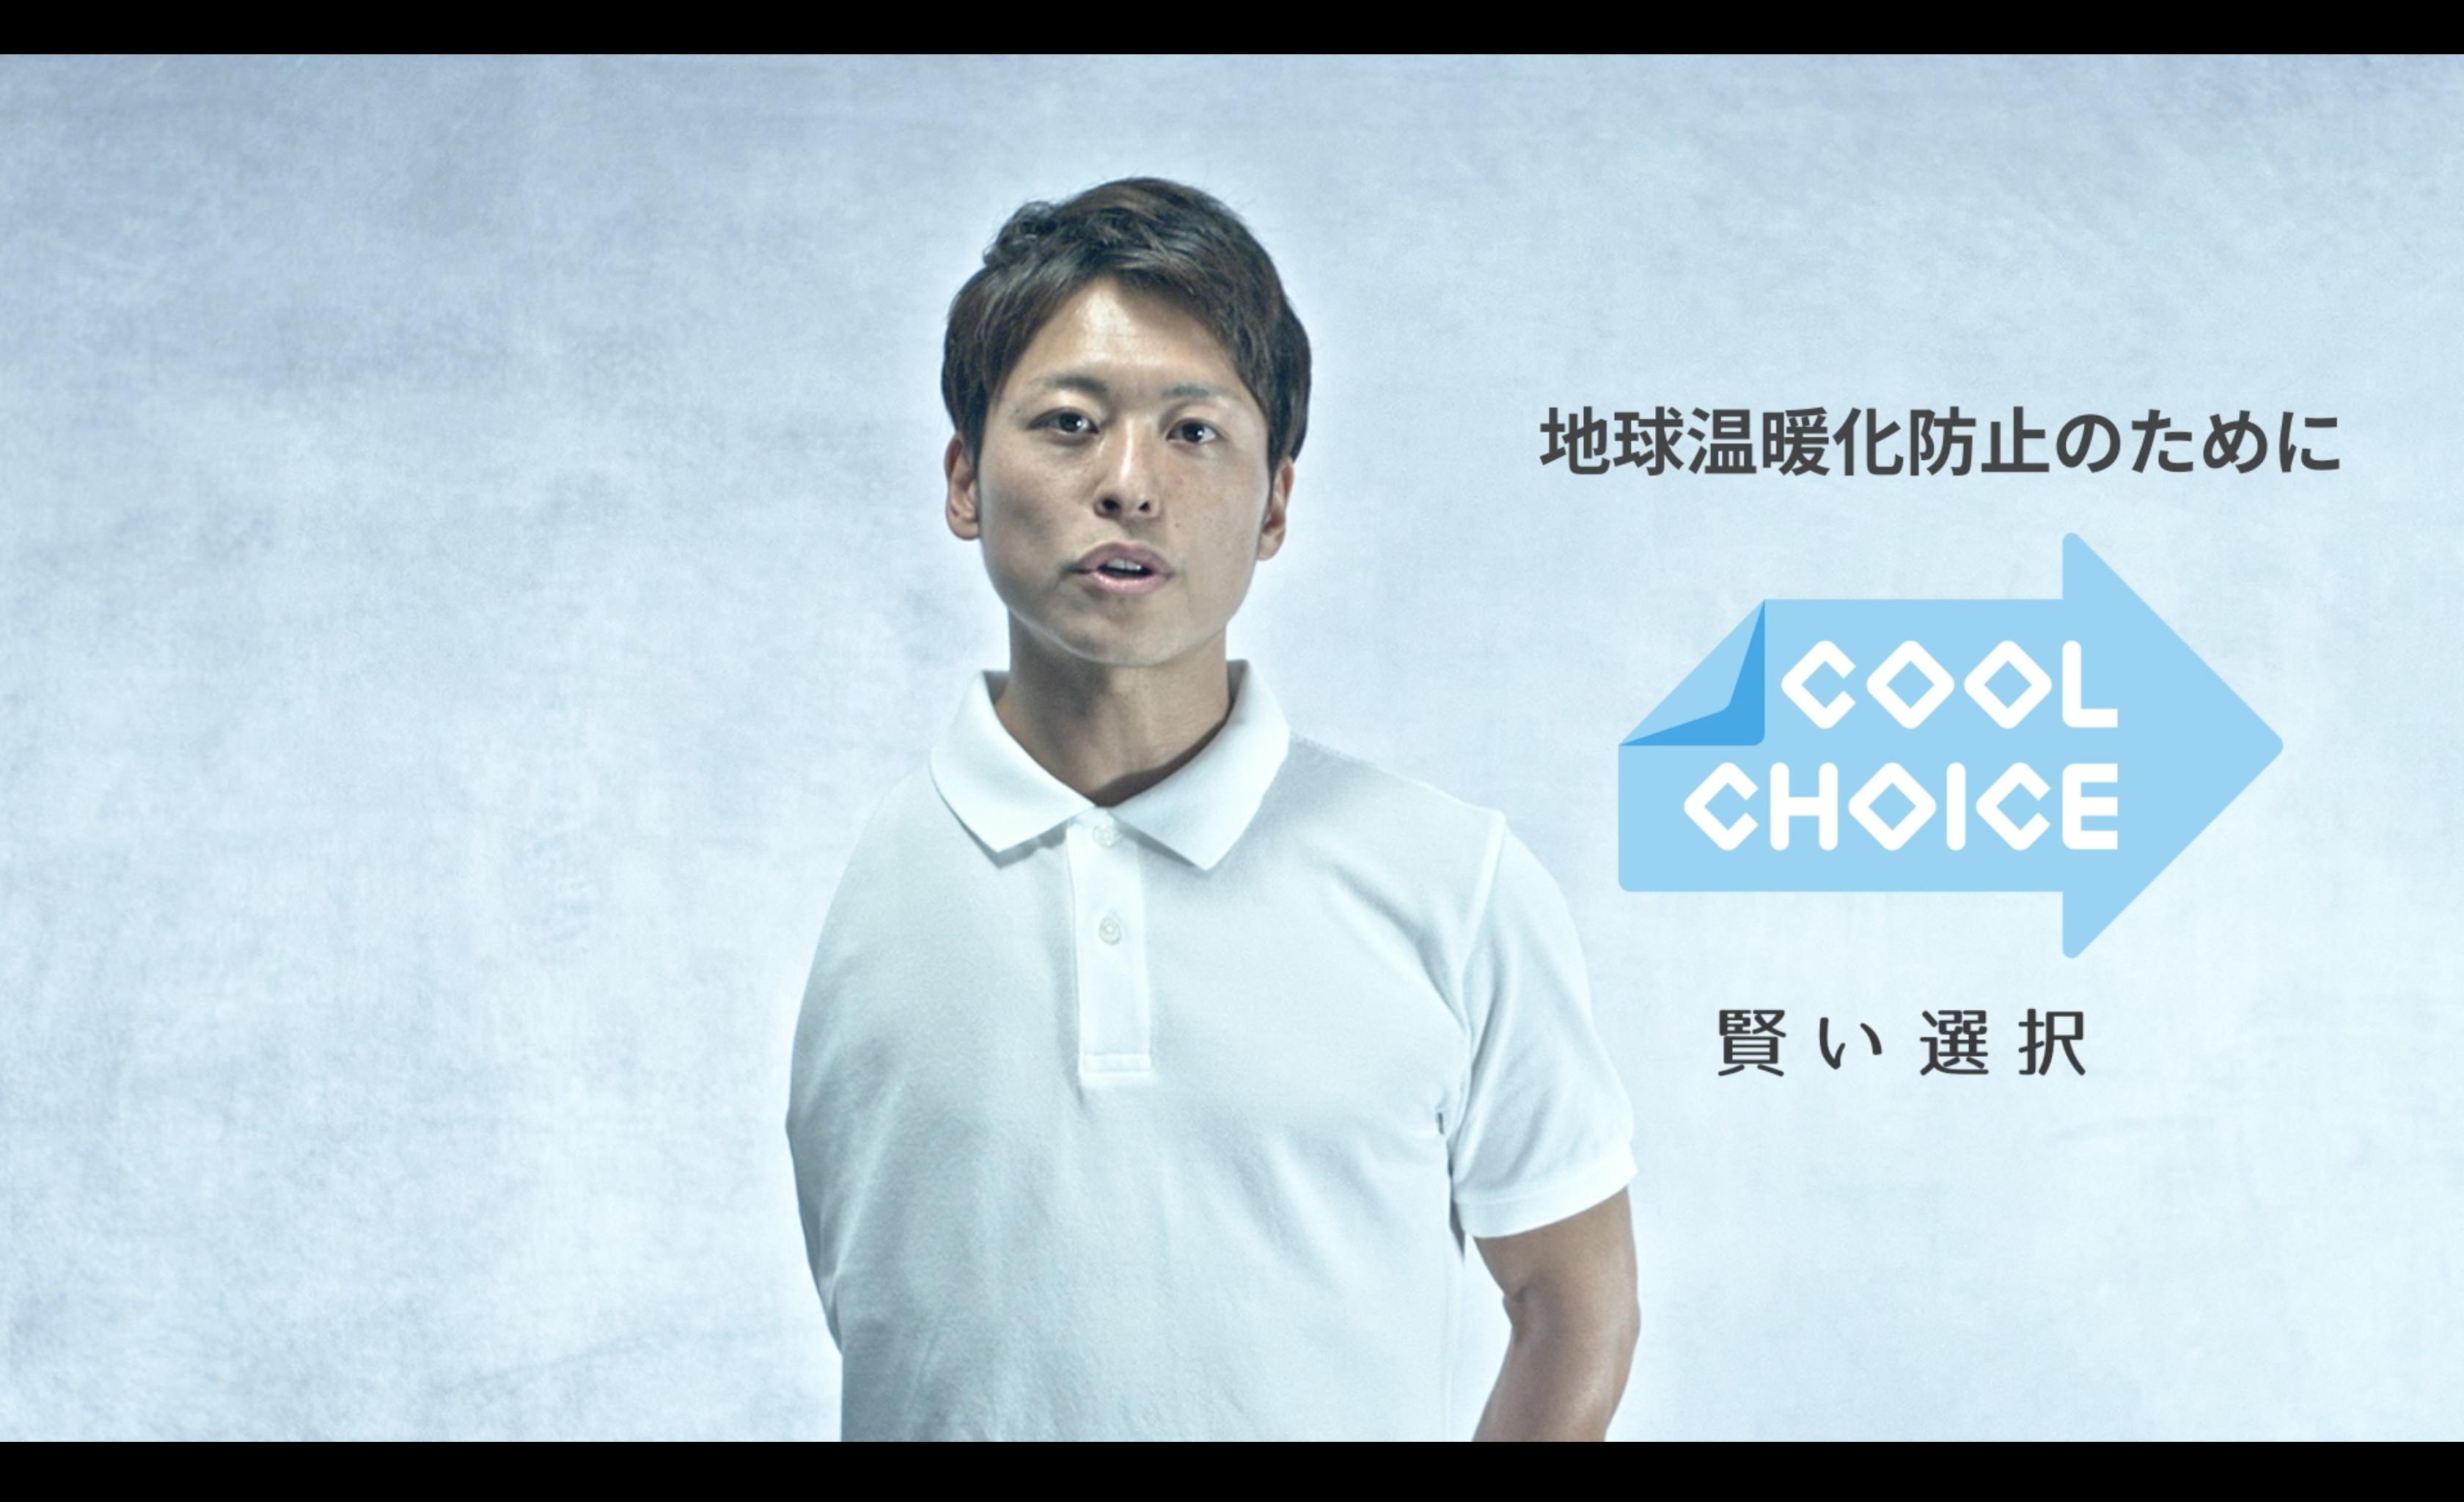 COOL CHOICE 賢い選択 トライアスロン 宇田 秀生 編